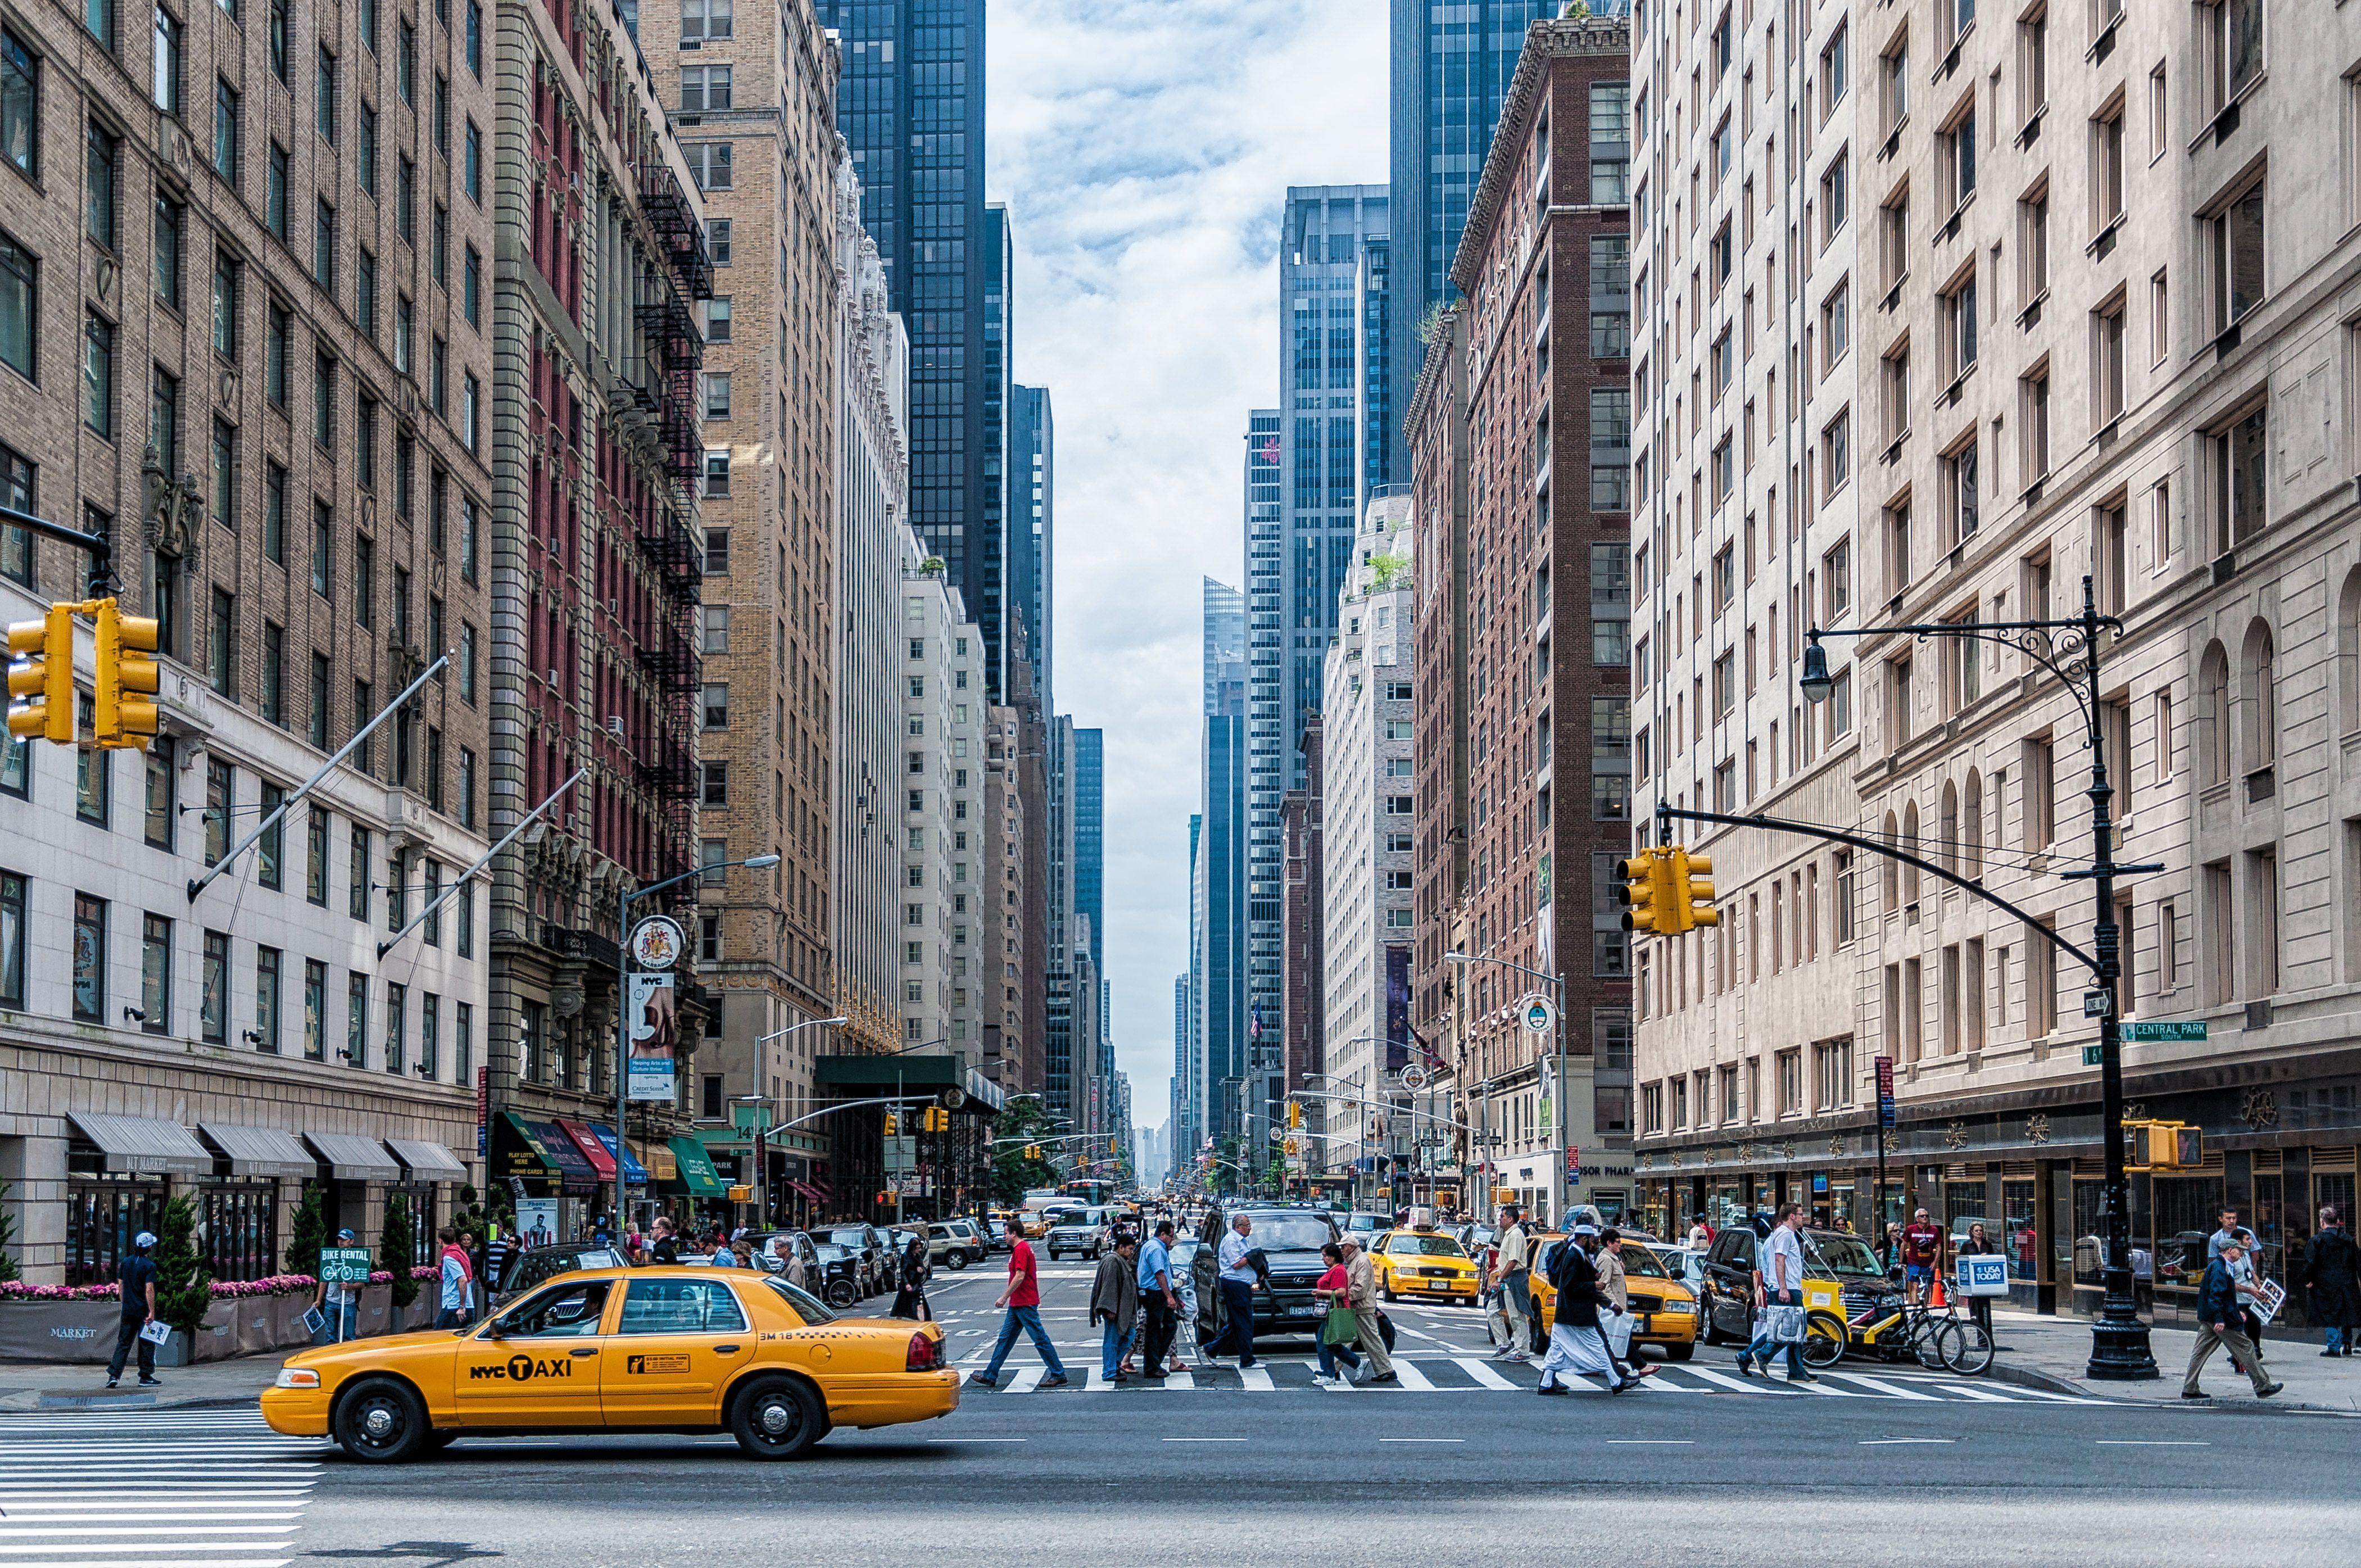 New York Street Wallpapers Top Free New York Street